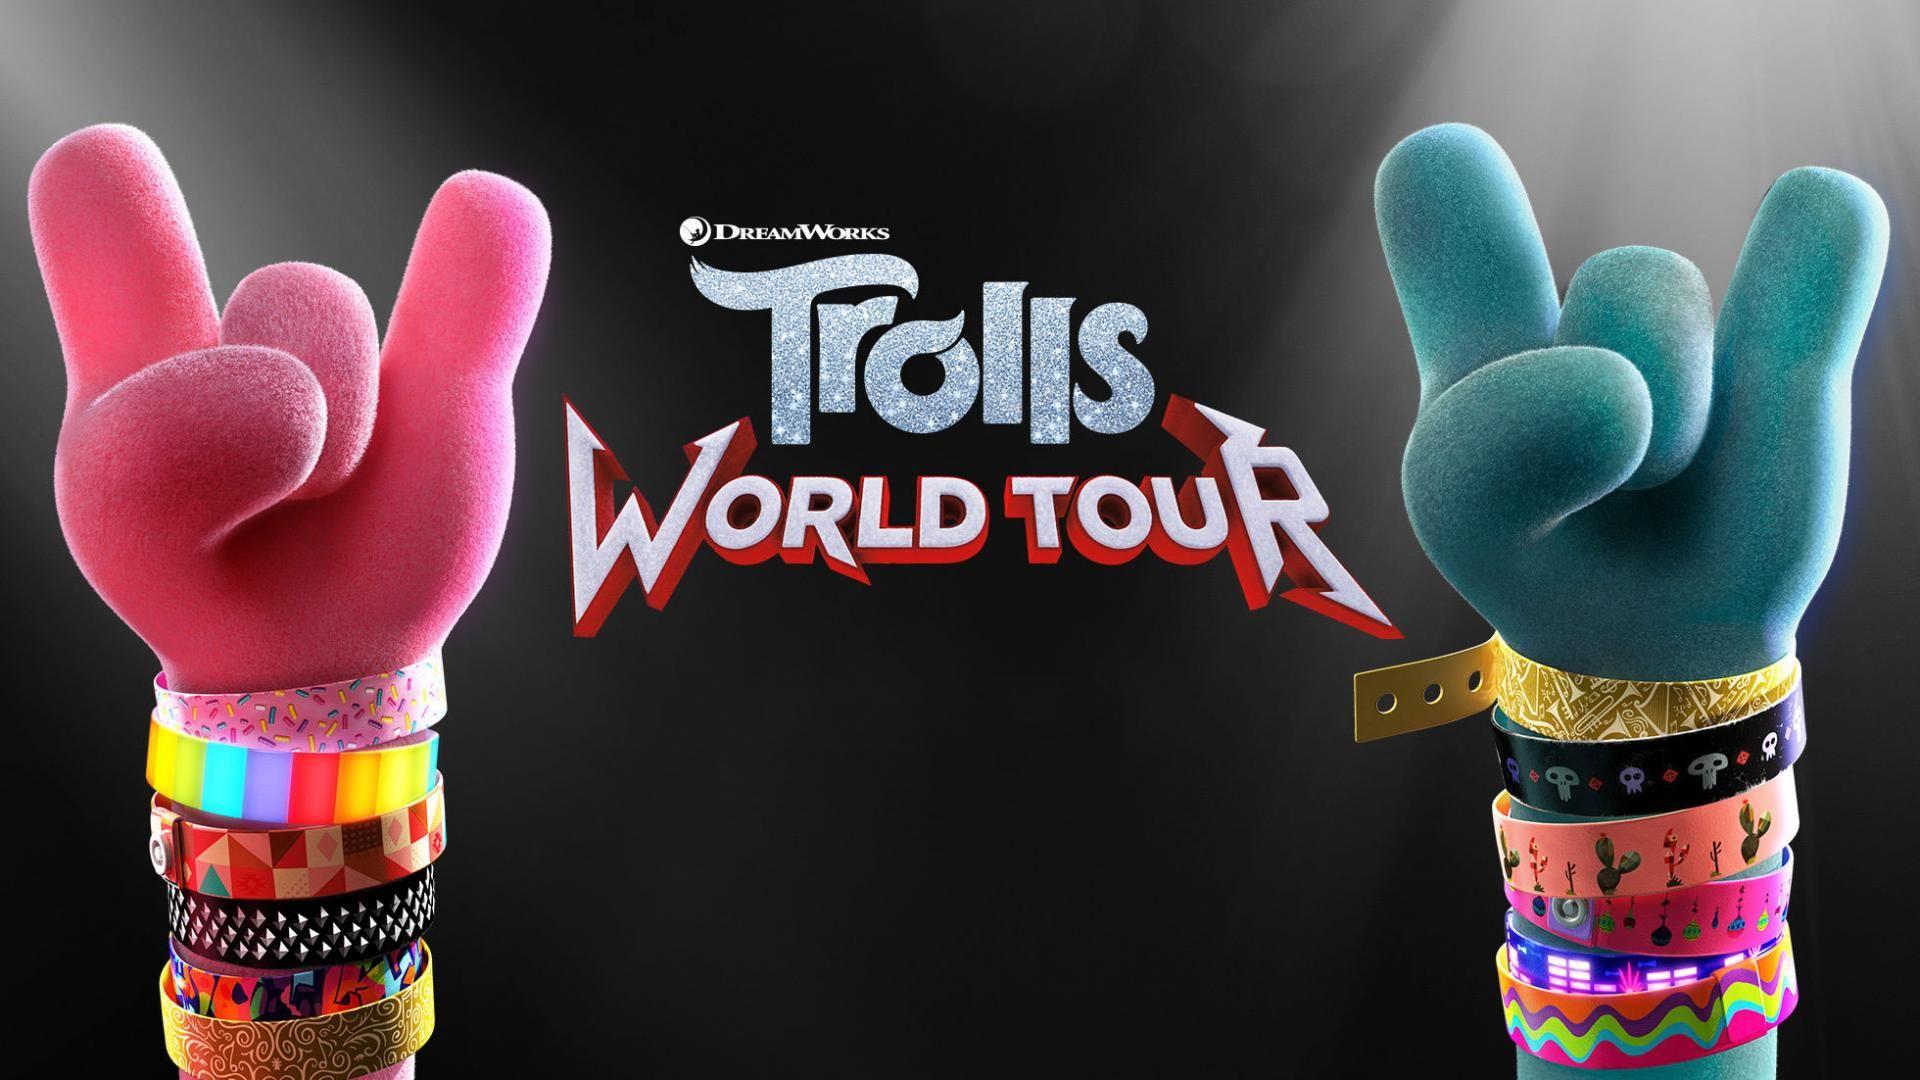 2020 04 10 Trolls World Tour In 2020 Full Movies Full Movies